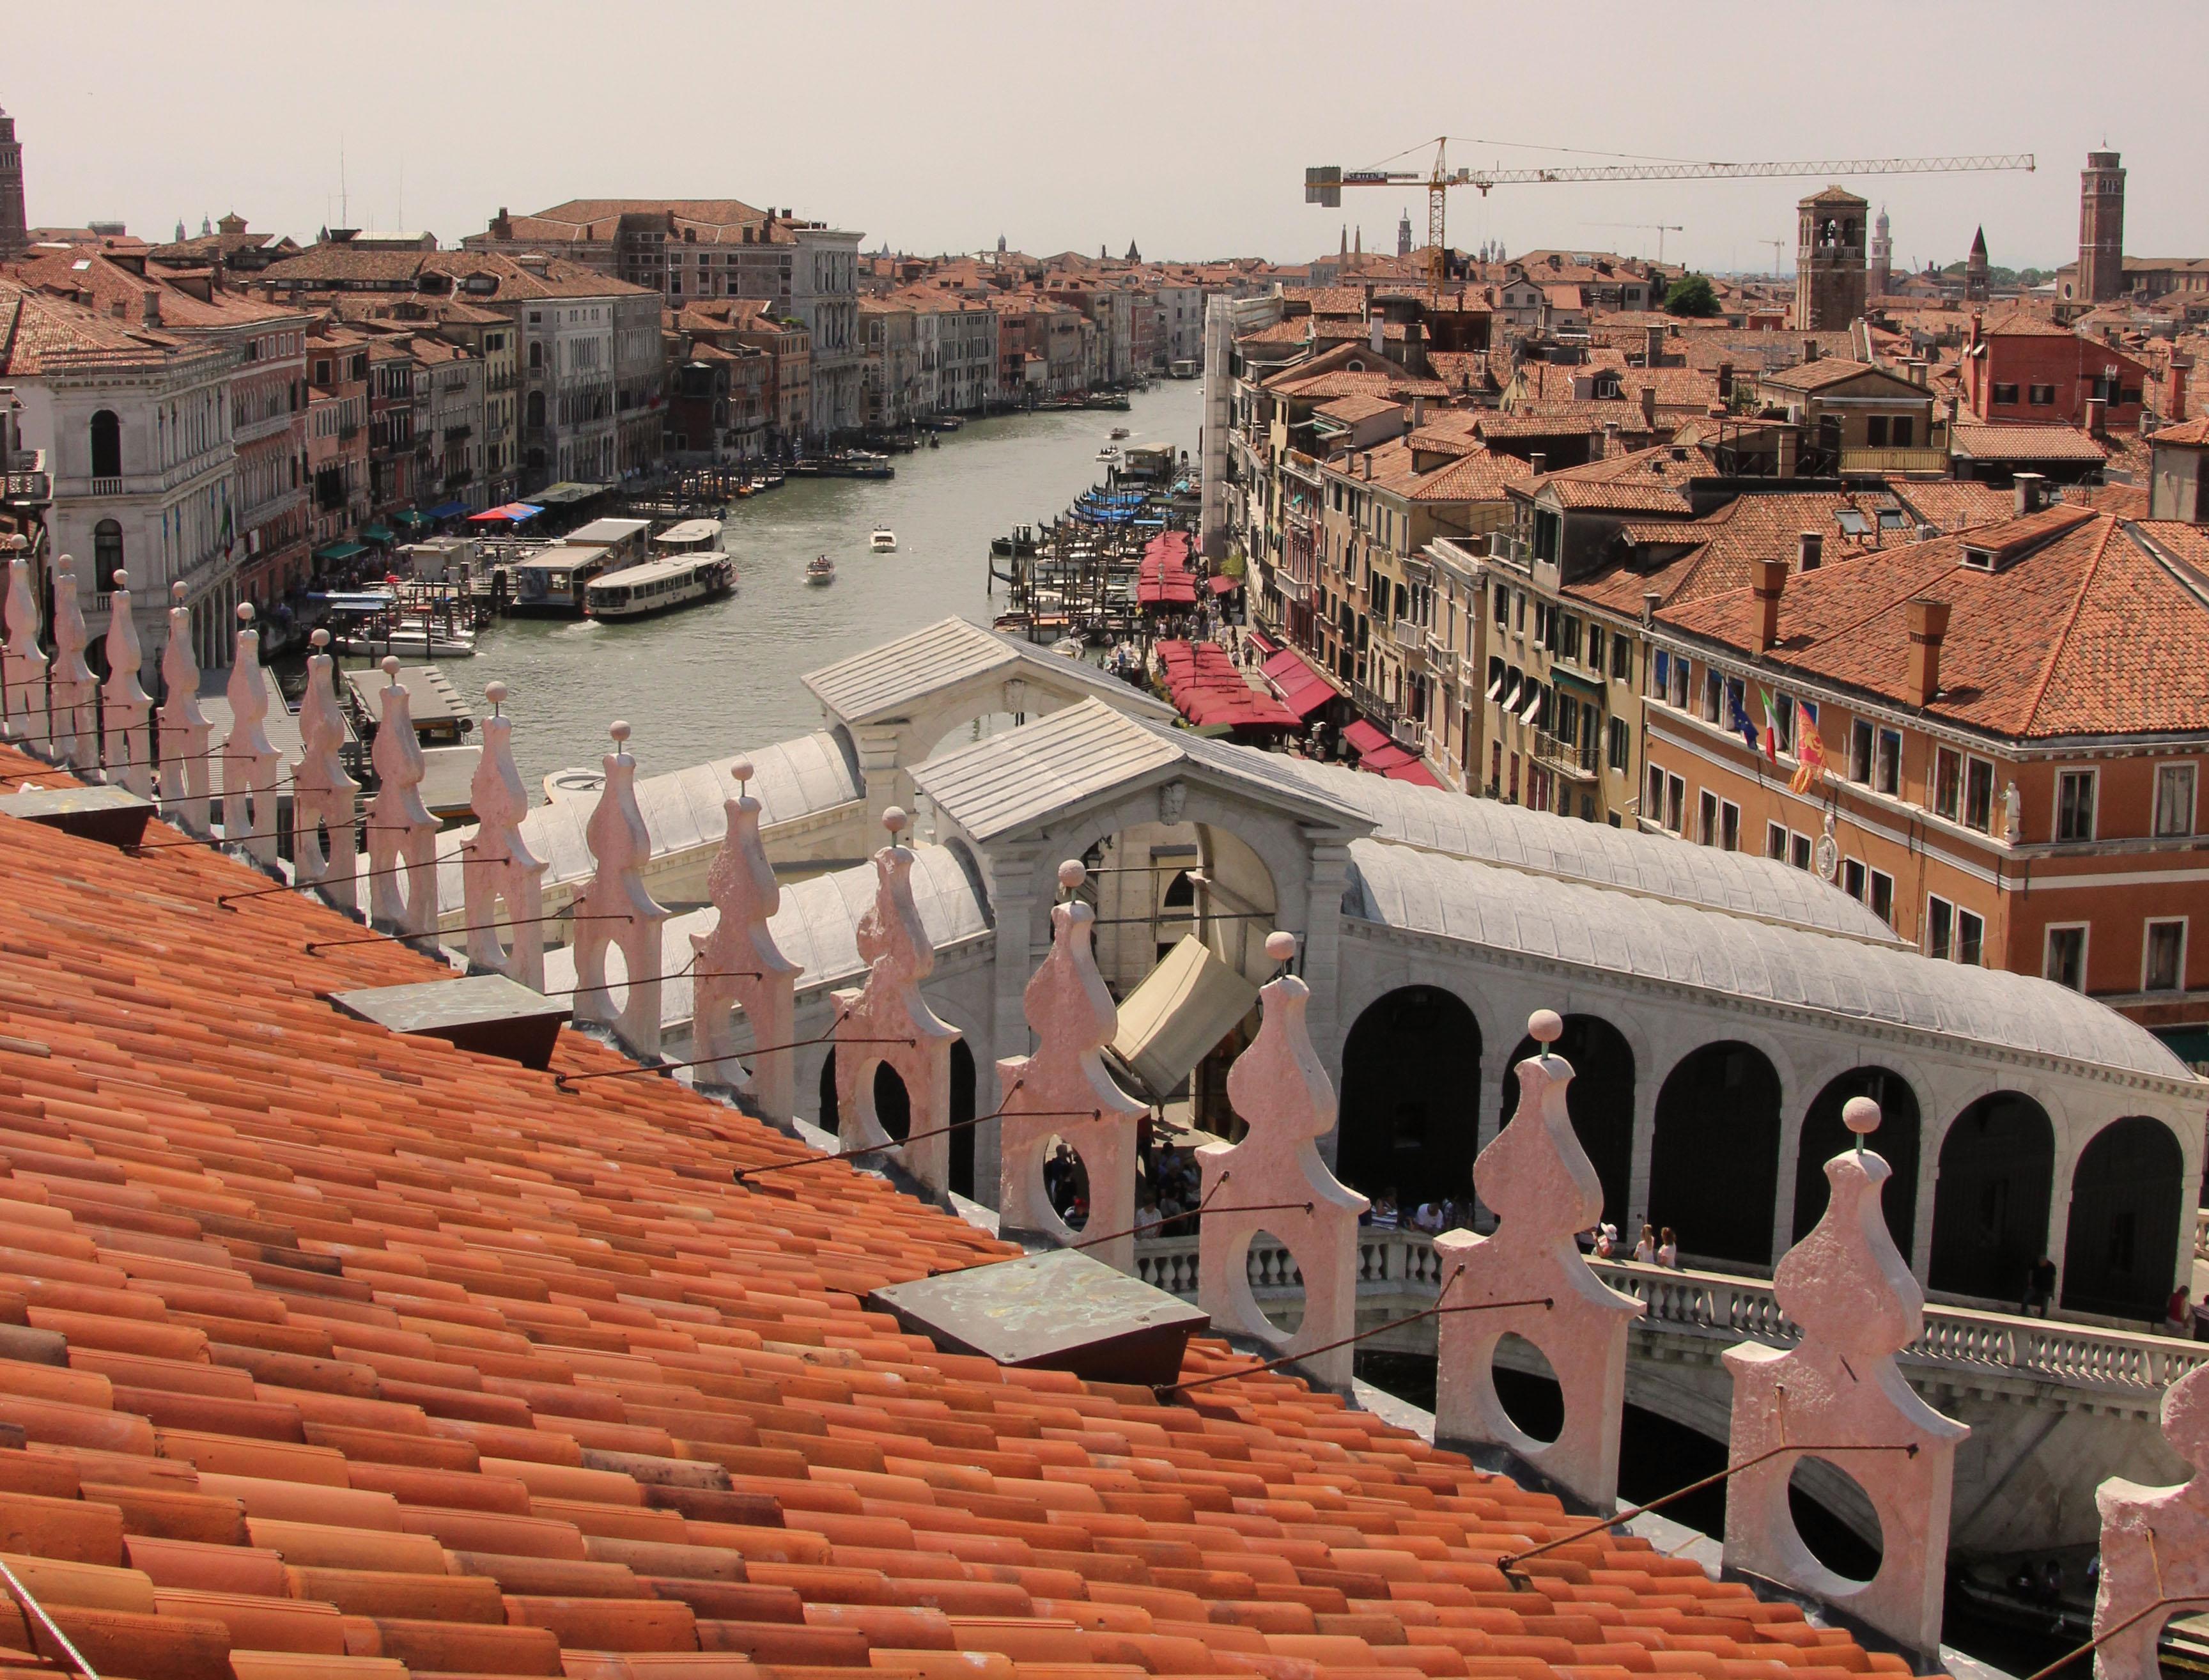 mia_und_ich_blog_modeblog_fahionblog_travel_reisen_venezia_venice_venedig_italien_italy